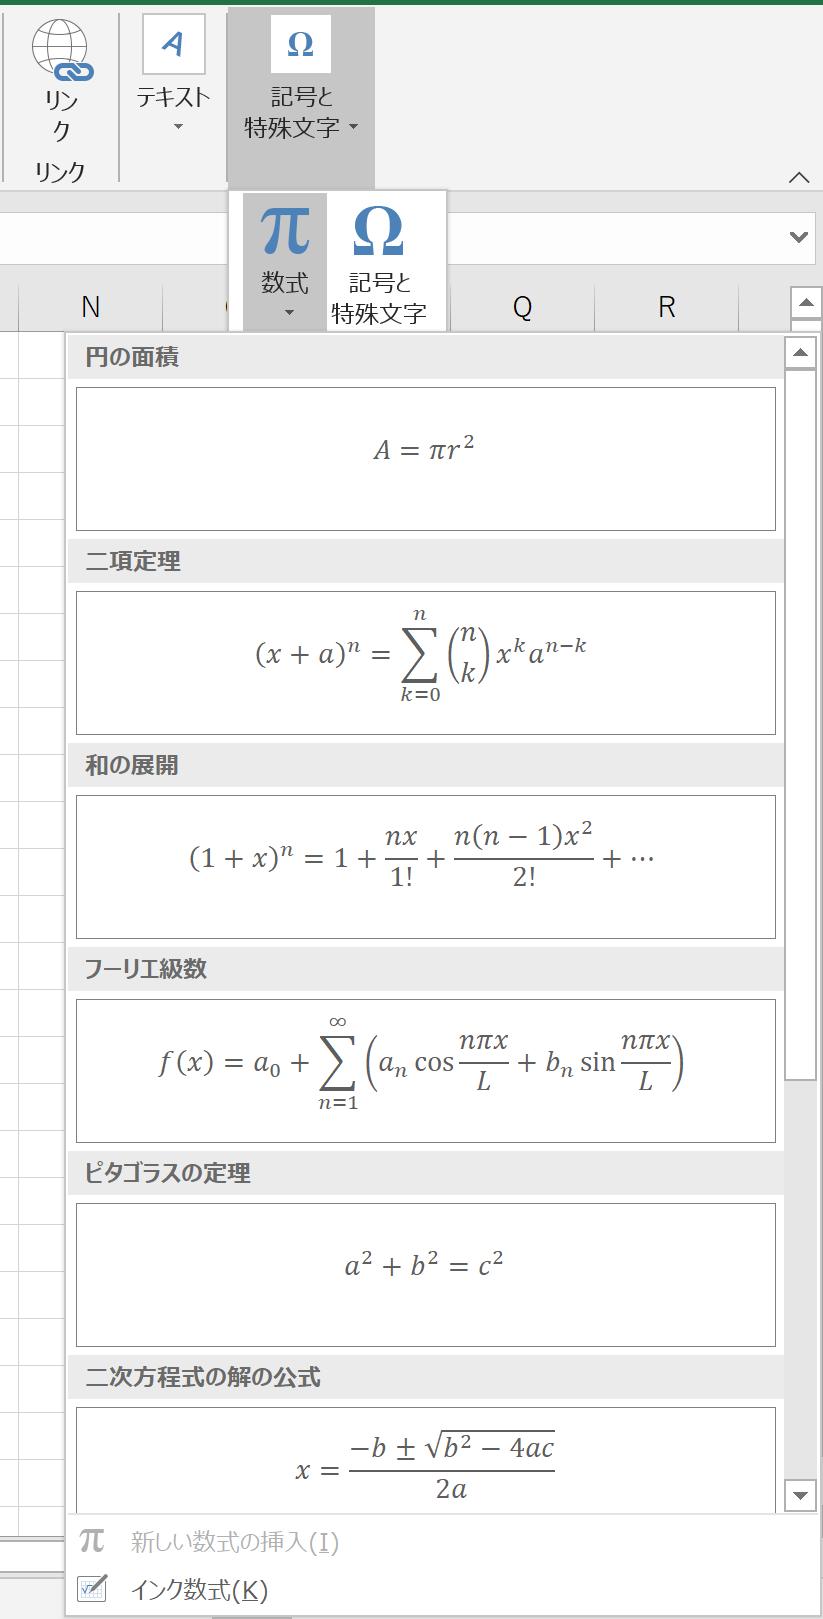 Excel 2019 [記号と特殊文字]>[数式]>「よく使われる数式」の一覧